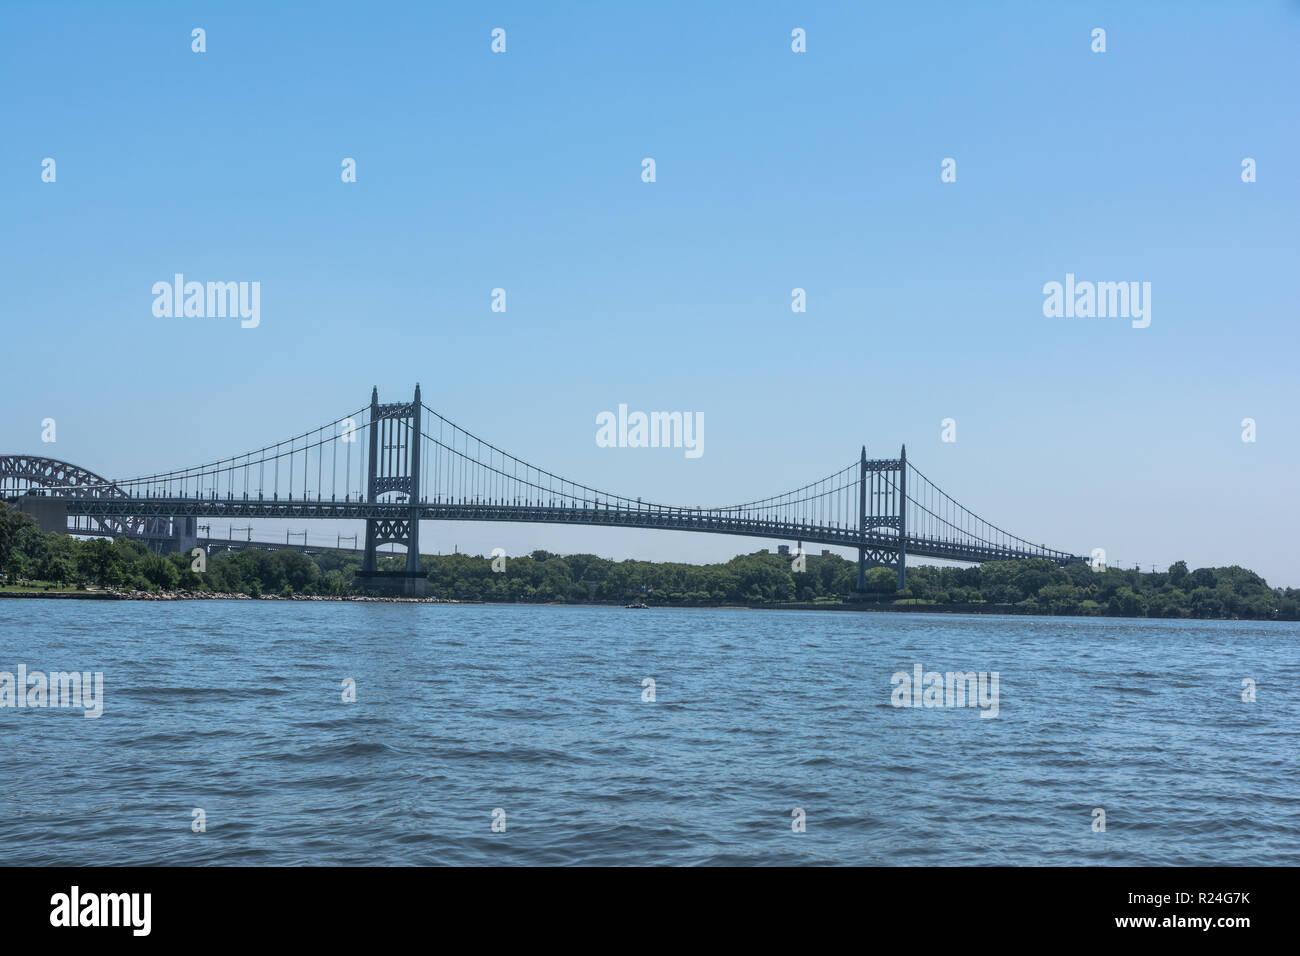 RFK Triborough Bridge over the East River, NYC - Stock Image